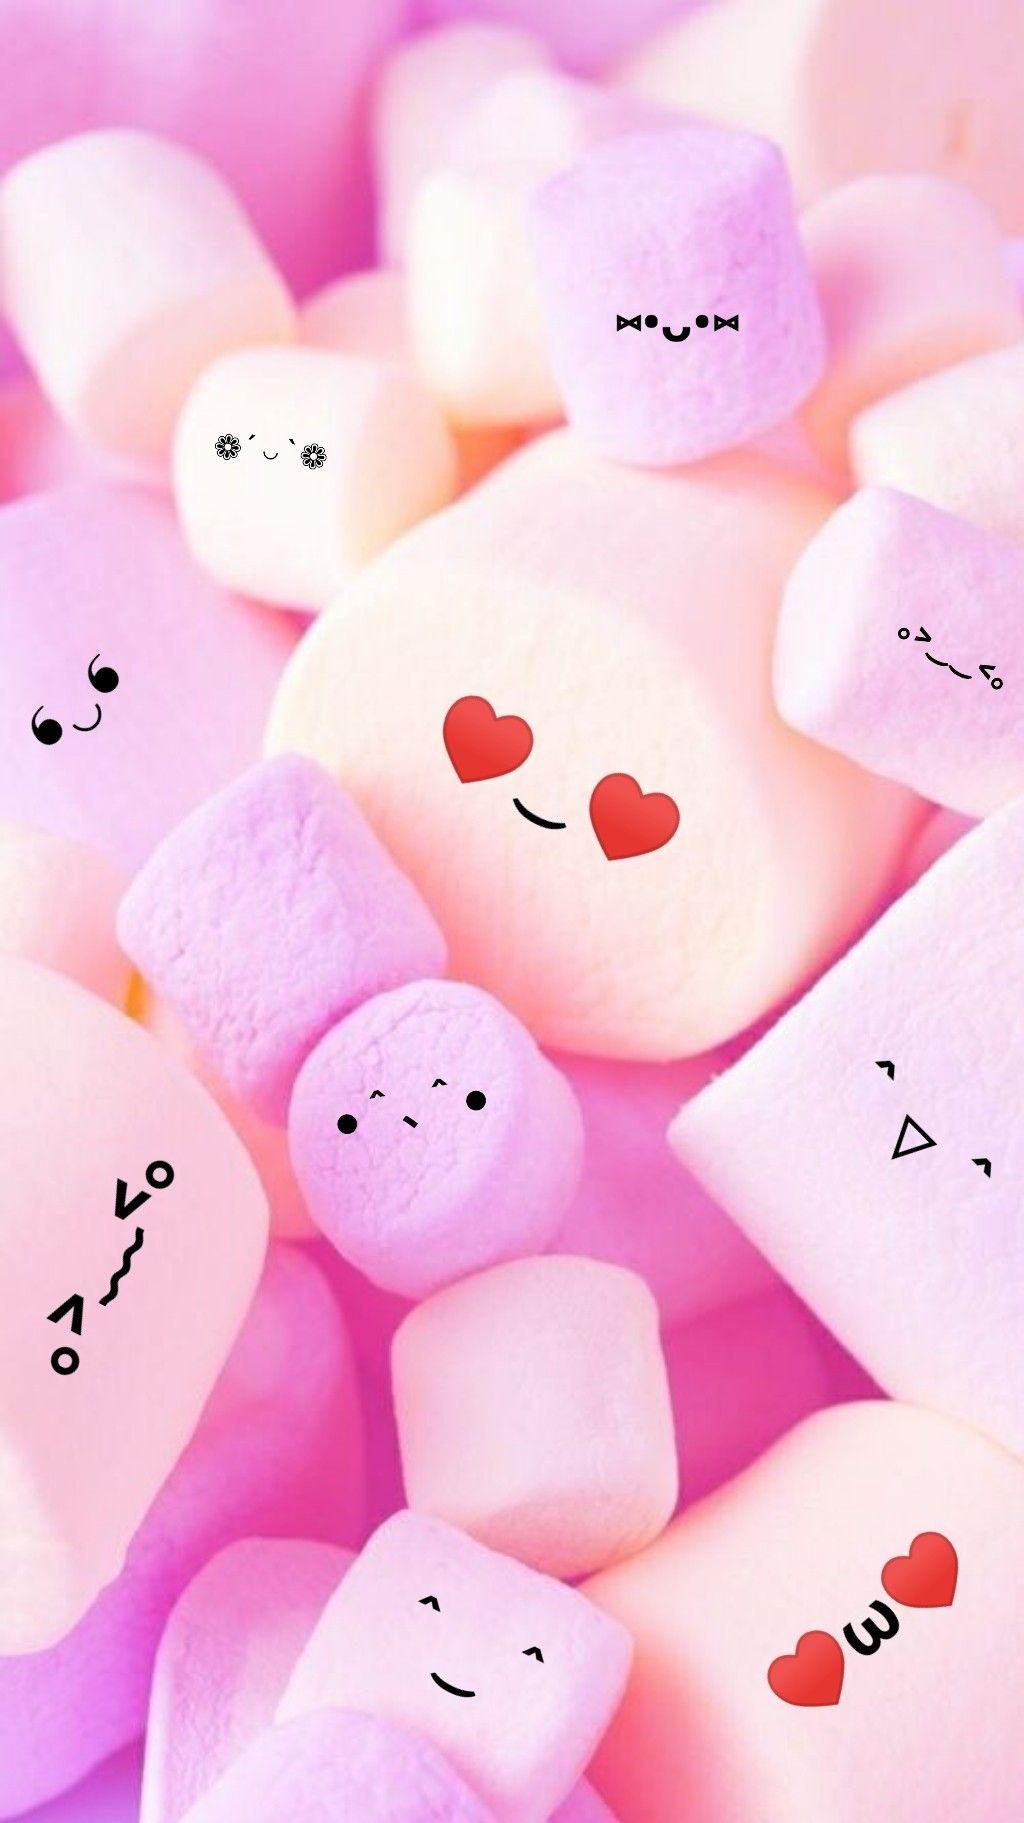 Marshmello Lucu Iphone Wallpaper Girly Cute Wallpapers Cute Food Wallpaper